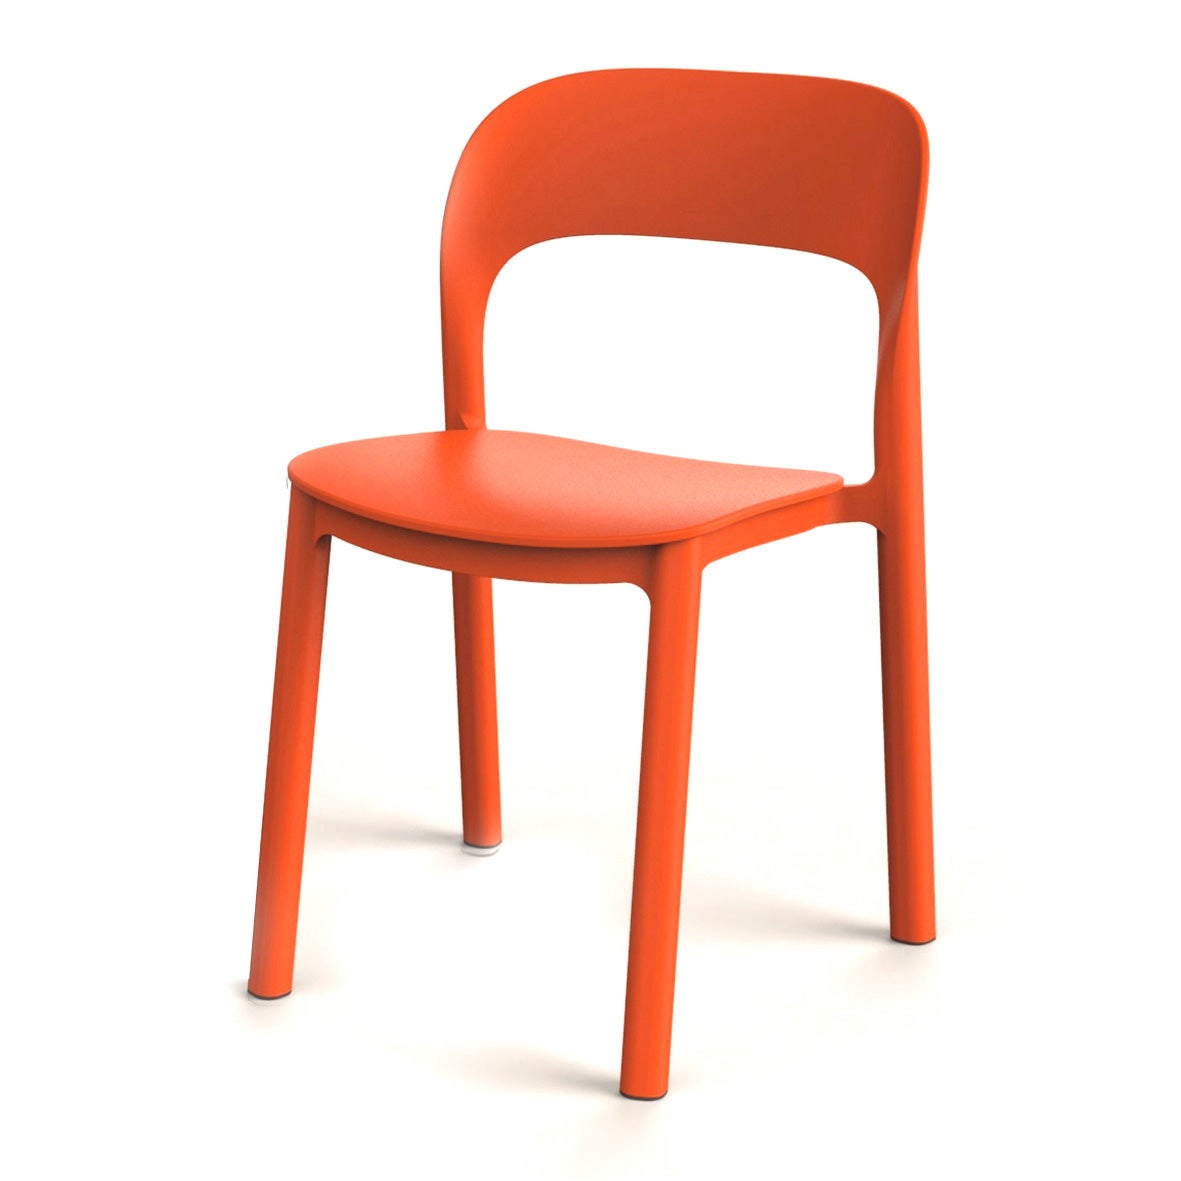 Chaise de jardin en résine injectée Ona orange